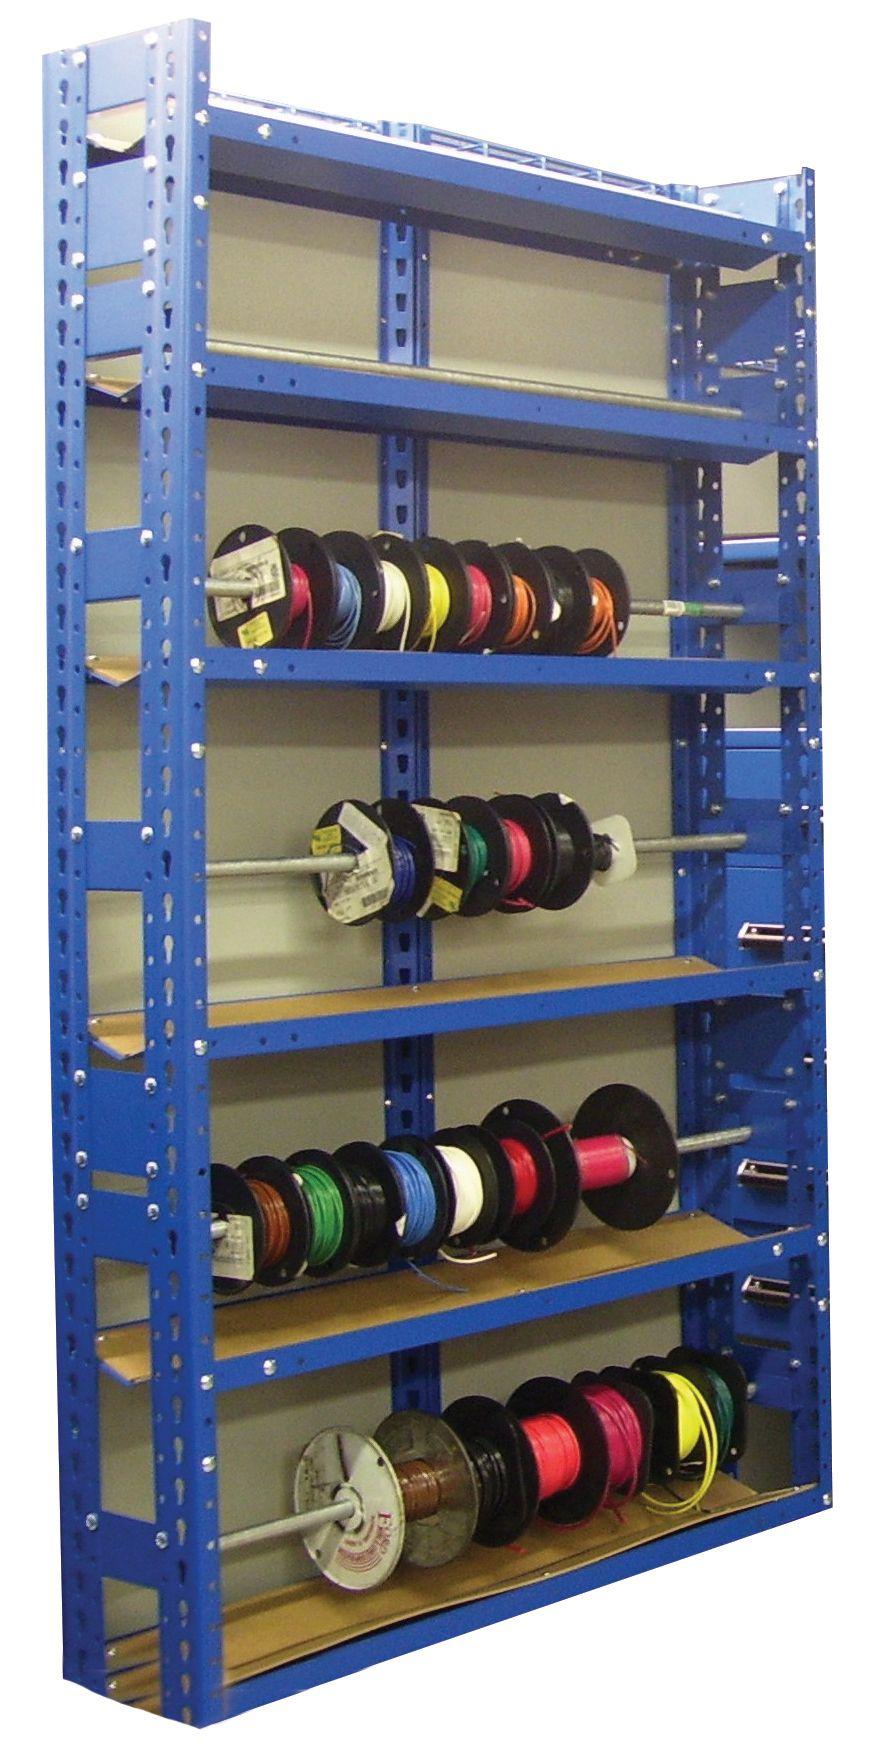 Wire Spool Rack Diy : spool, Storage, Cable, Spool, Organizer, Shelves, Adjustable, Levels, Rack,, Storage,